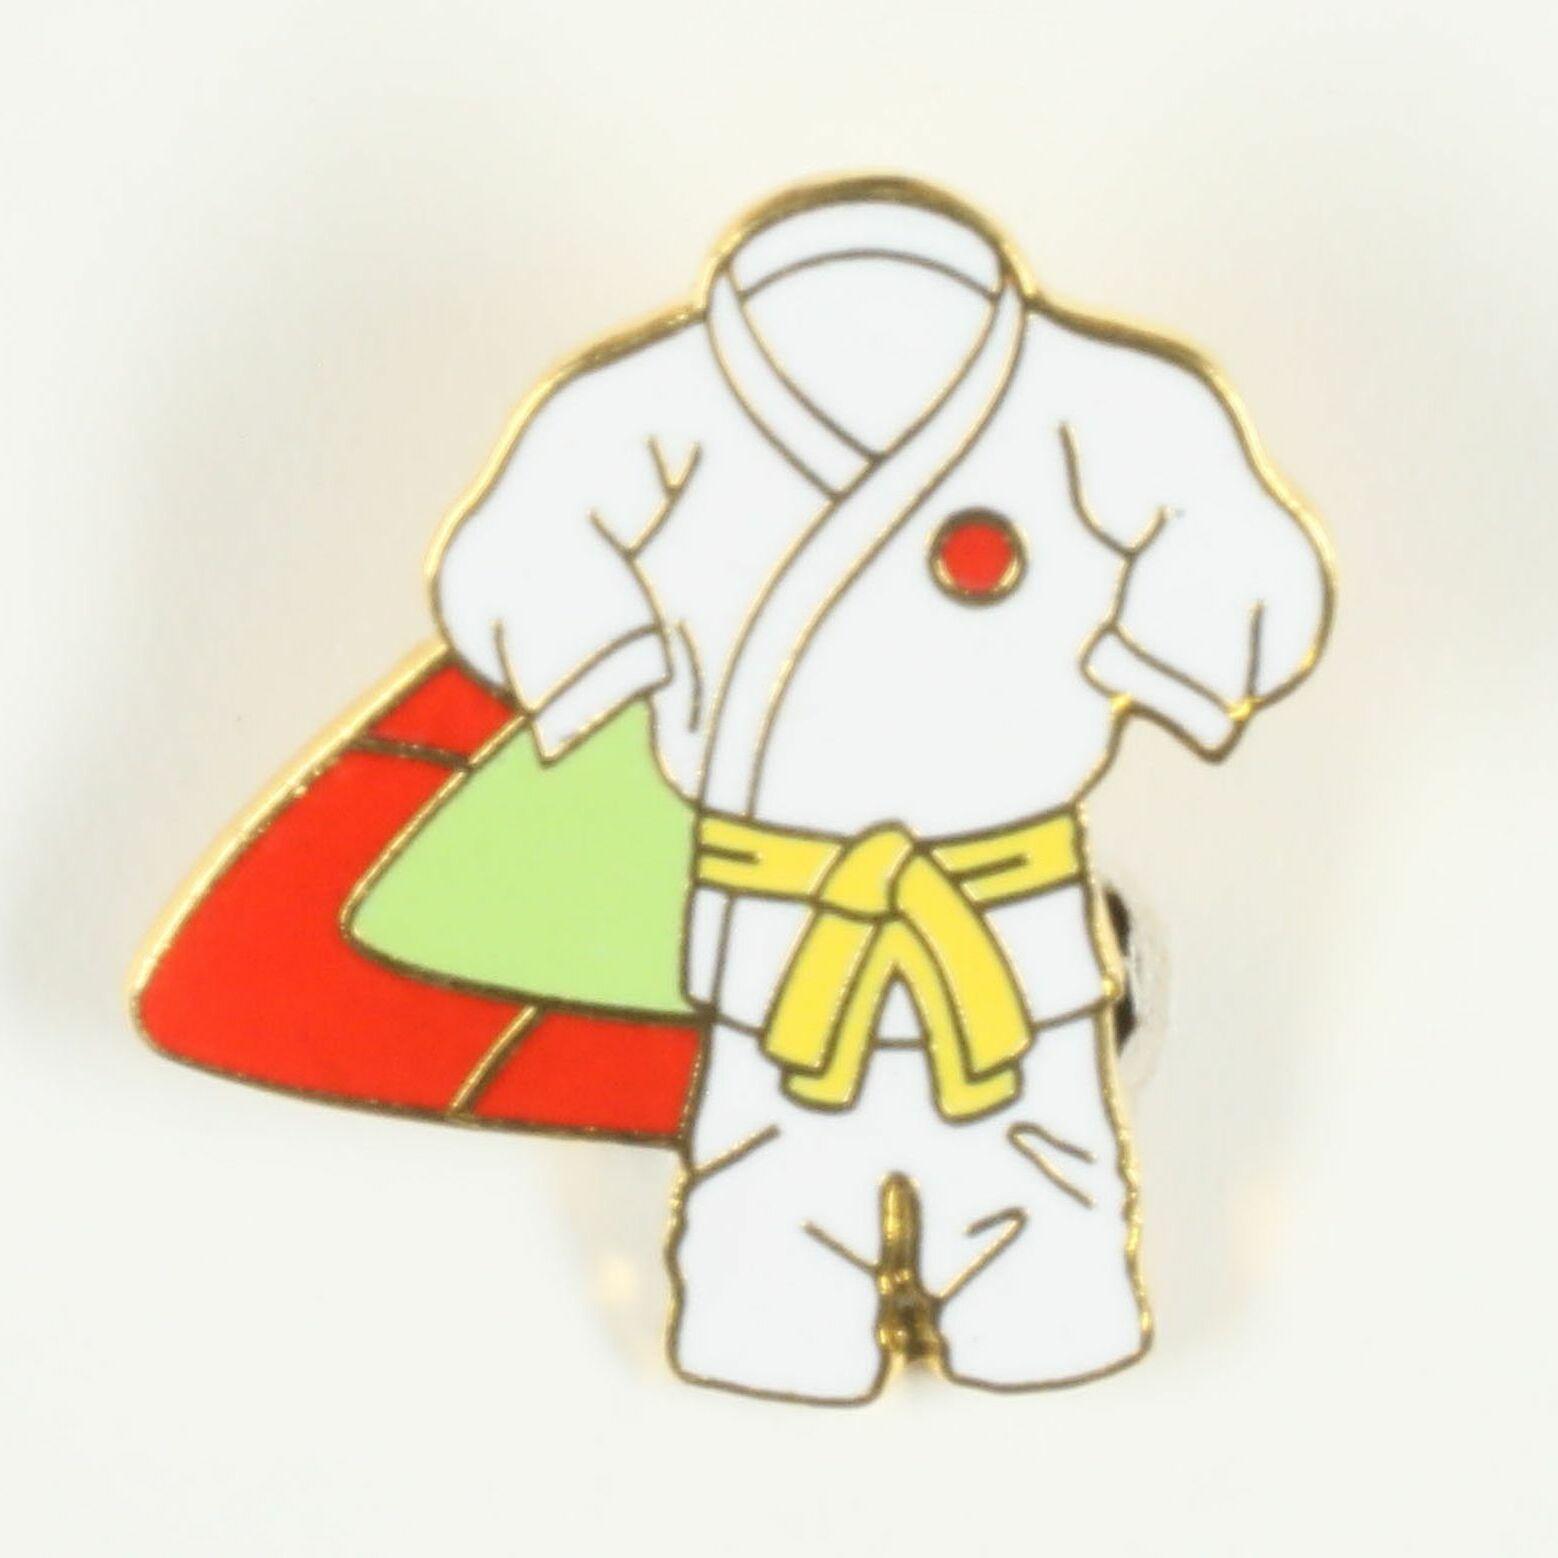 Kimono ceinture jaune